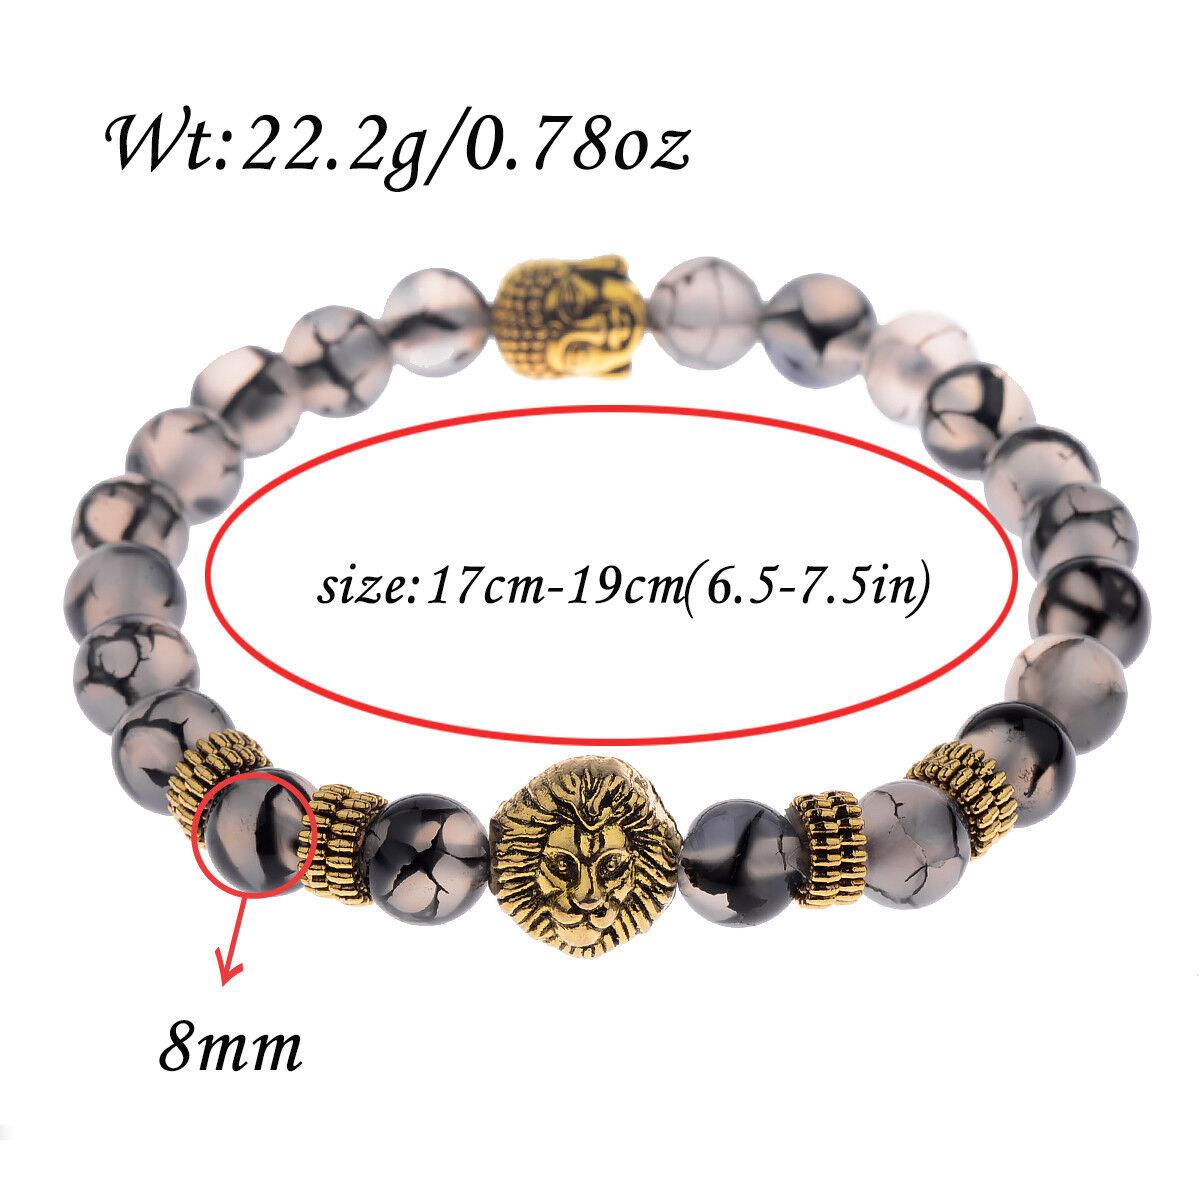 1Pcs Men Women 8MM Gemstone Beaded Braided Bracelets Charm Fashion Jewelry Gift 7